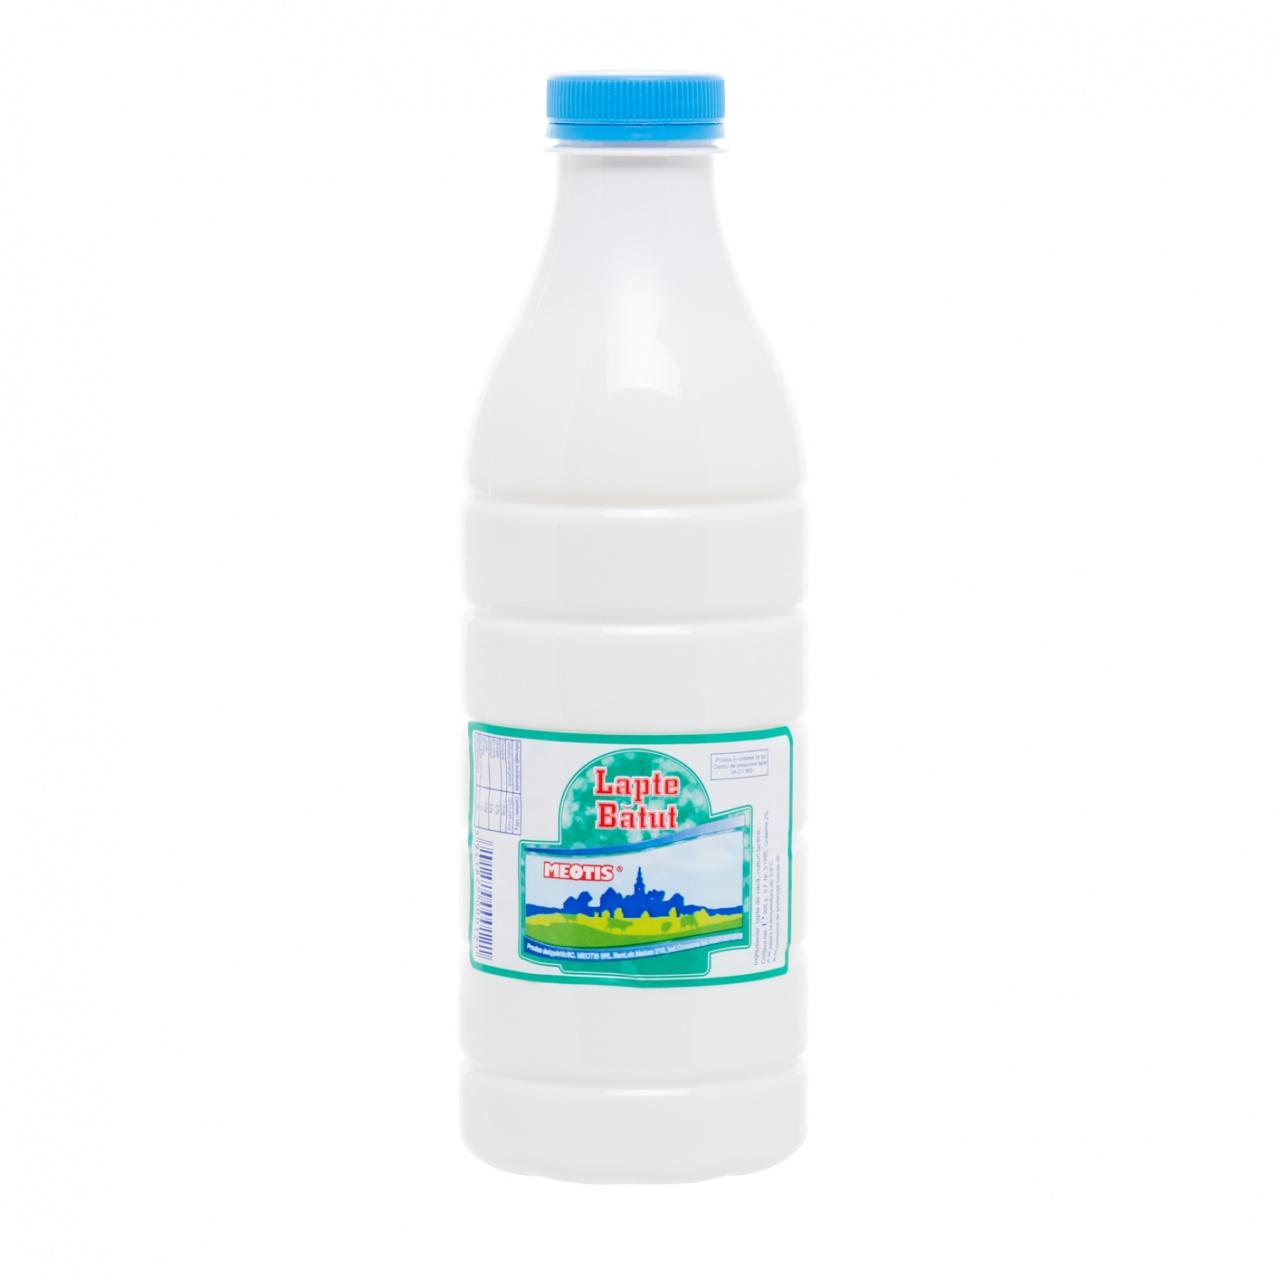 Lapte bătut 2%, 450g